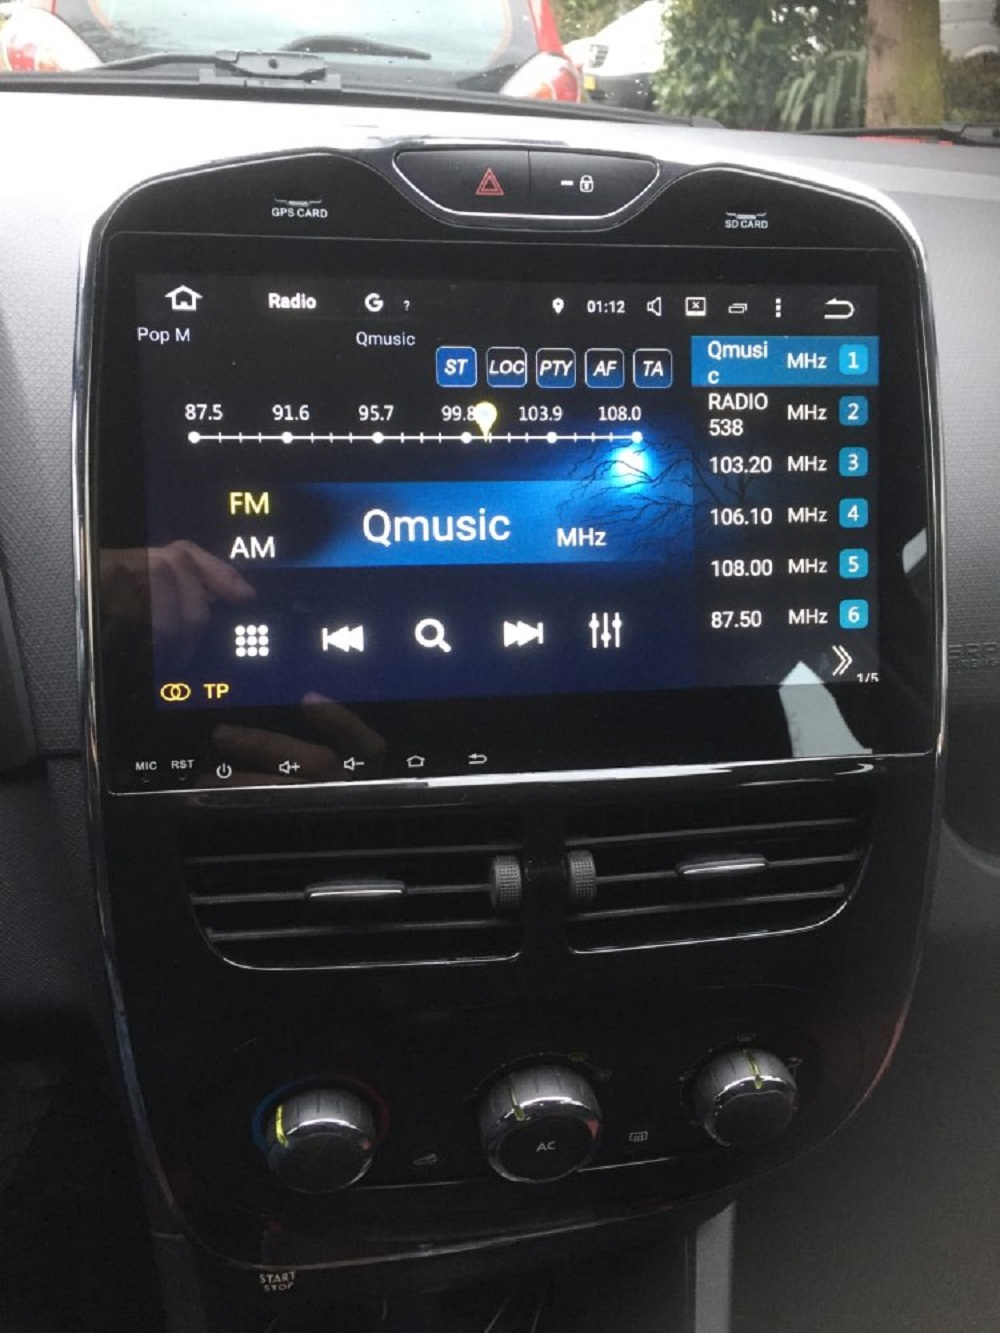 4GB RAM 10.1 Android 8.0 Car Radio Audio GPS for Renault Clio 2014 2015 2016 2017 GPS Radio Bluetooth WIFI Mirror link USB DVR